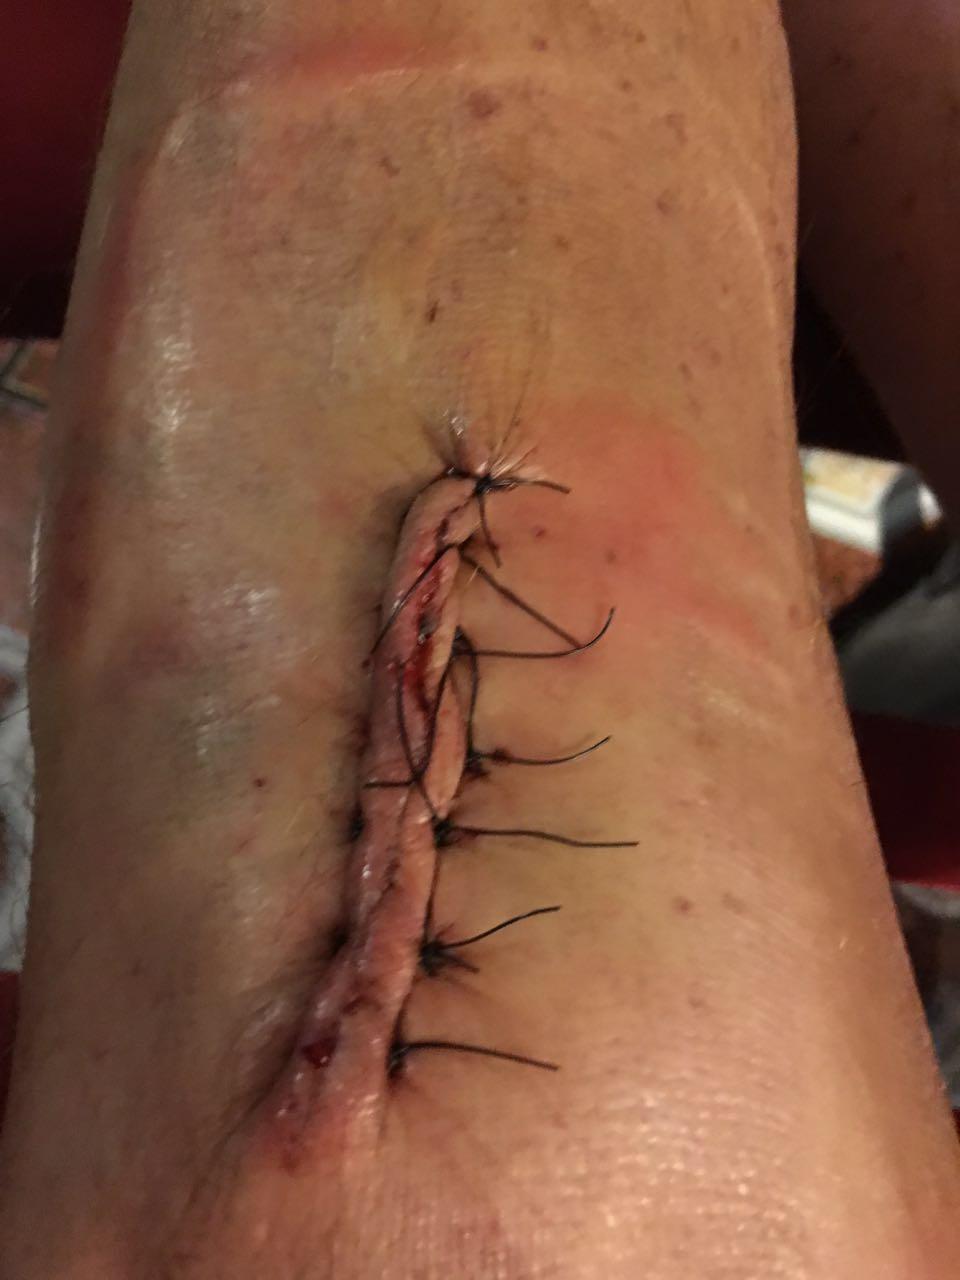 Tim's latest surgery